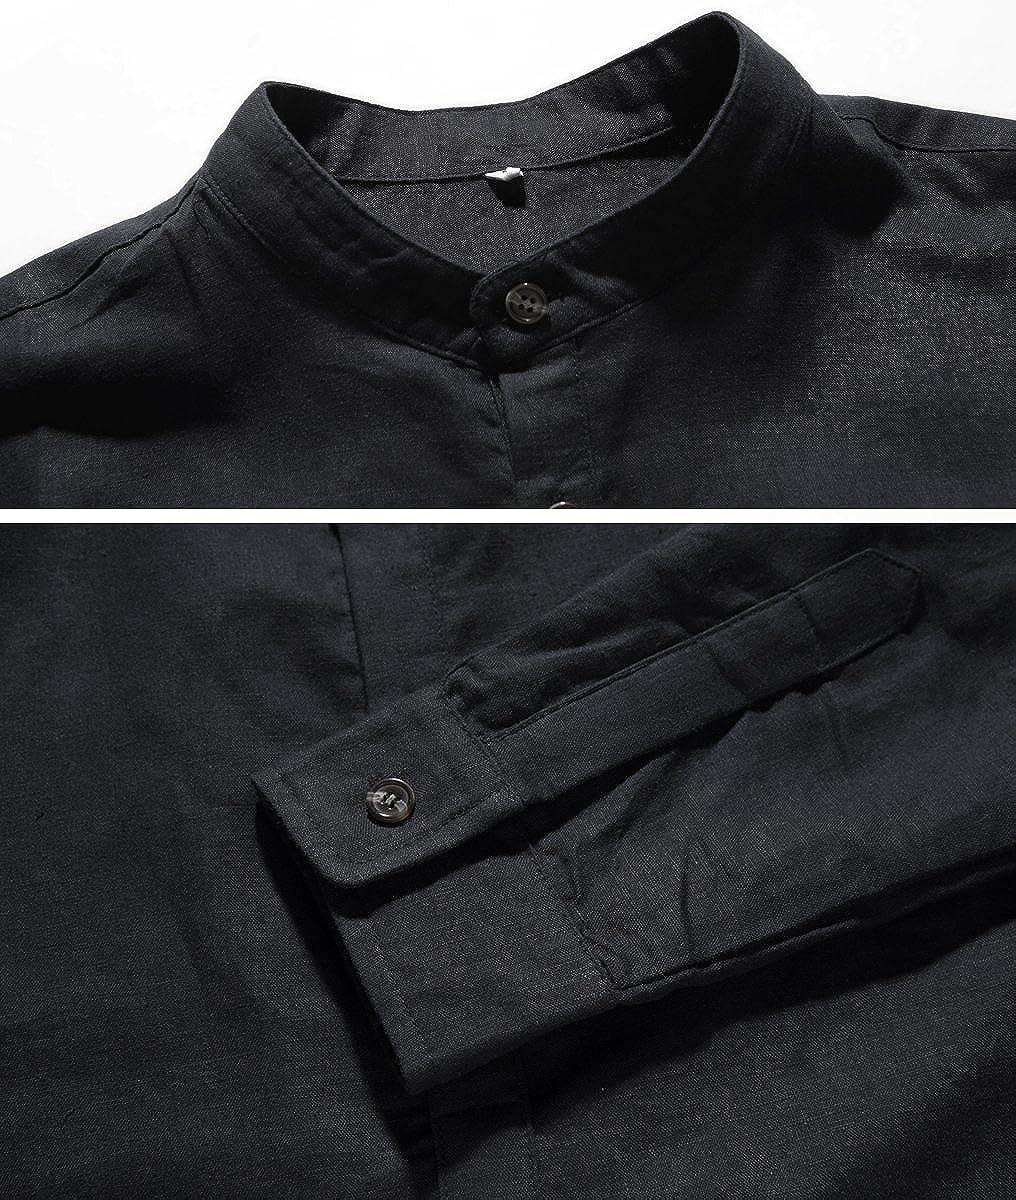 NITAGUT Men Henley Neck Long Sleeve Daily Look Linen Shirts